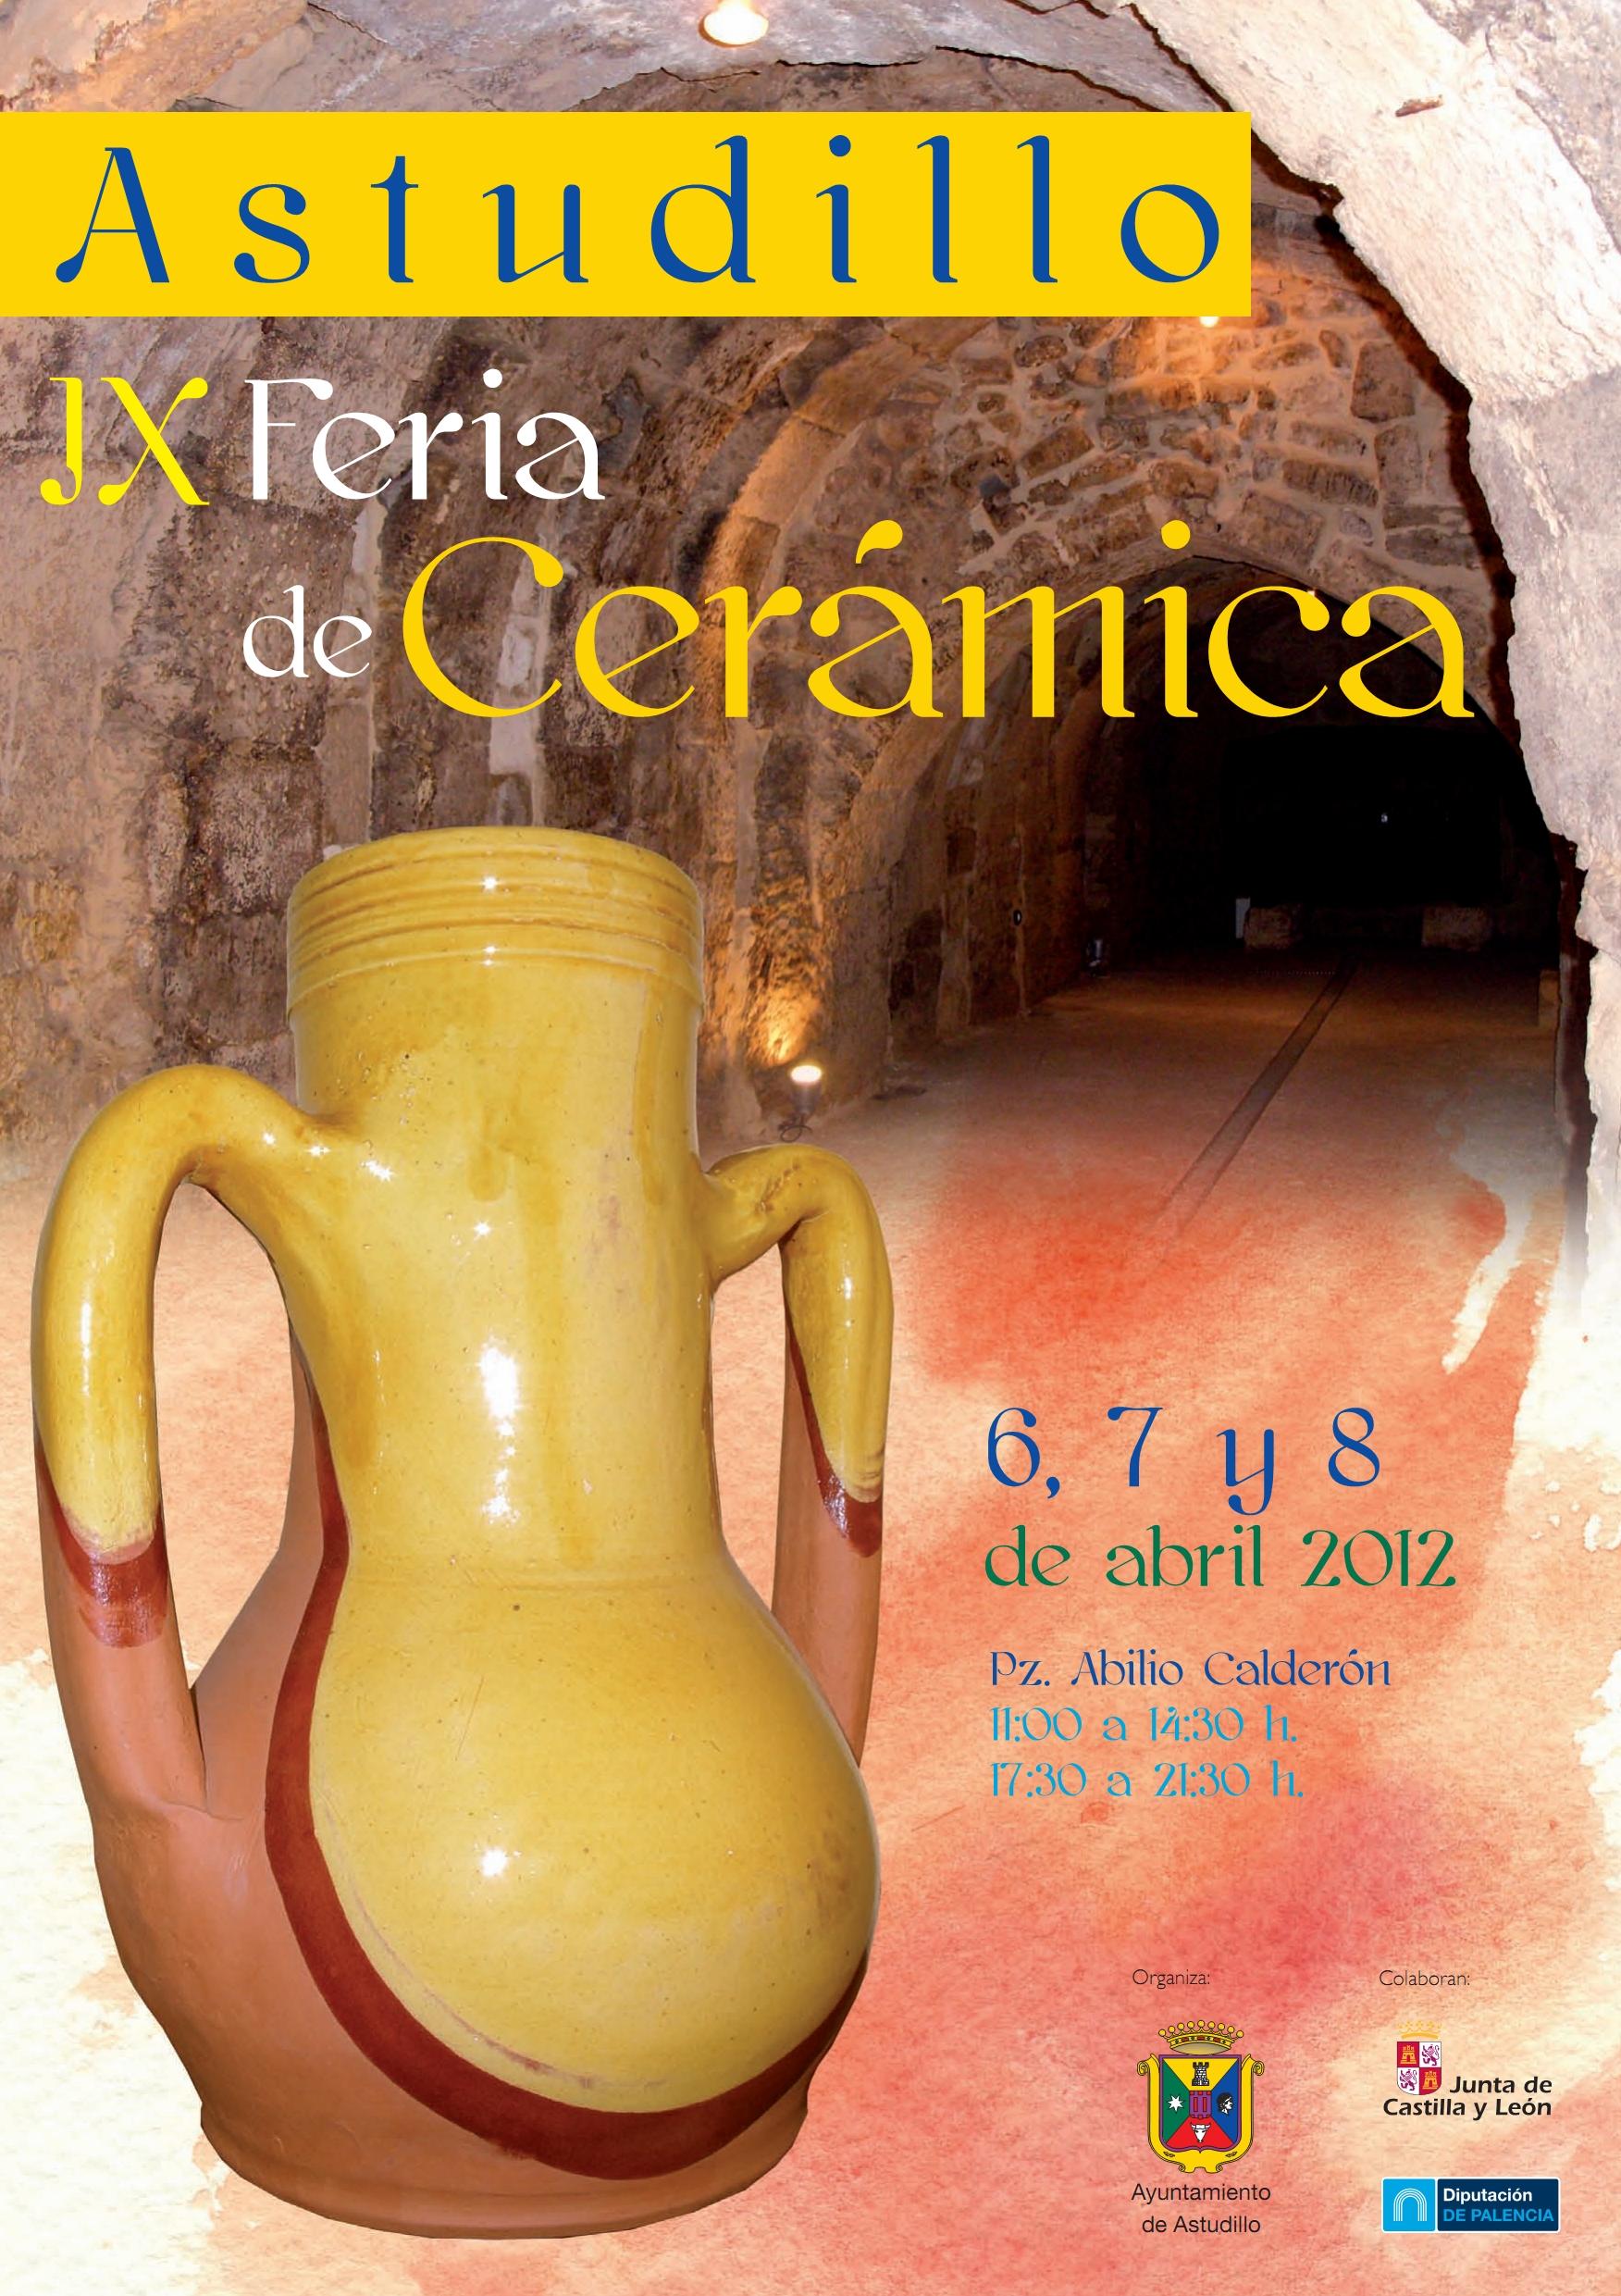 IX Feria Nacional de Cerámica de Astudillo